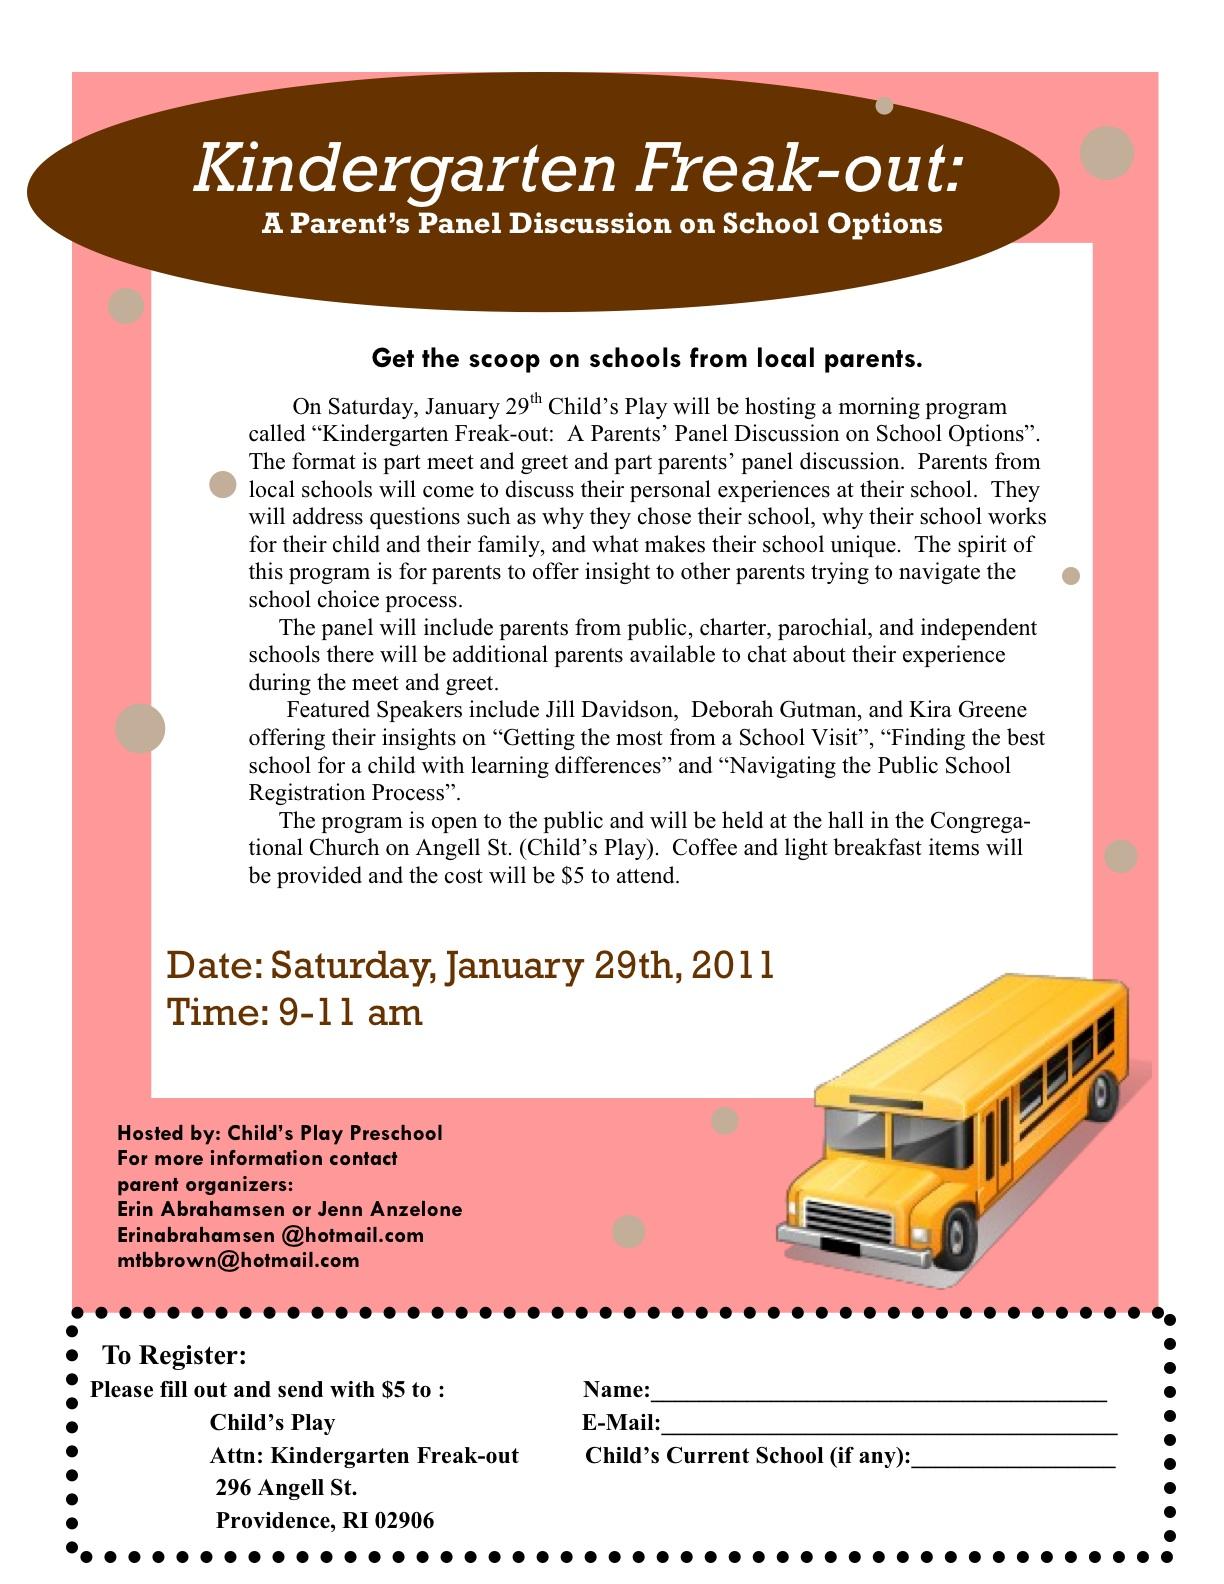 preschool registration process providence schools and beyond quot kindergarten freak out 701